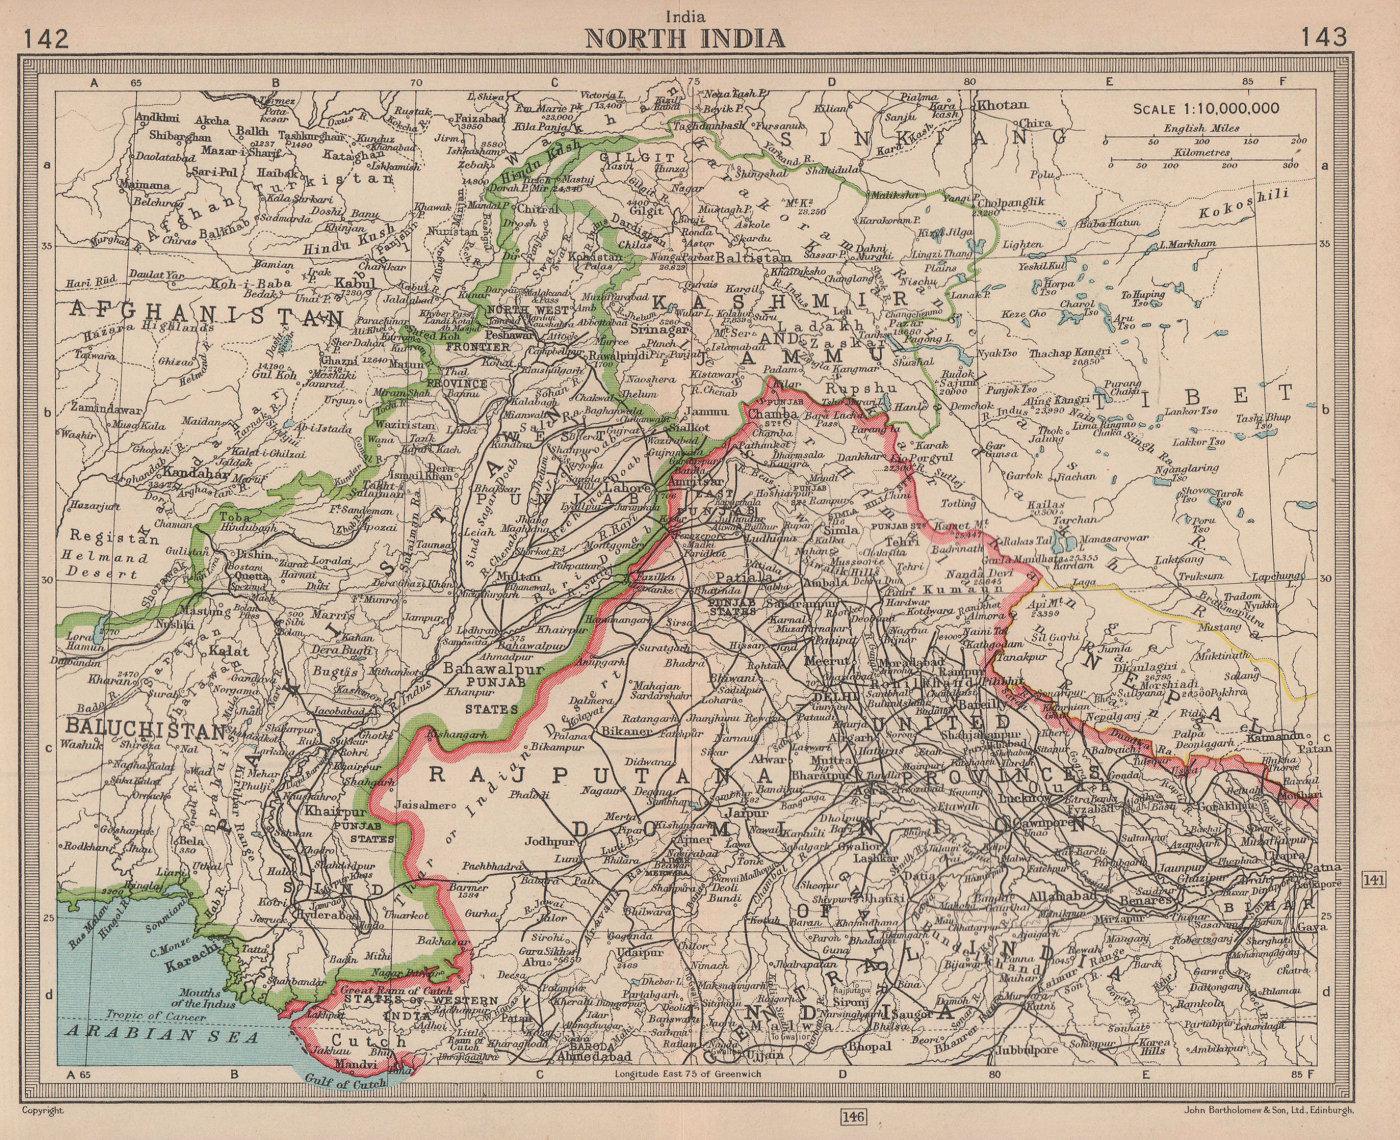 North India. Pakistan. Unresolved Jammu & Kashmir. BARTHOLOMEW 1949 old map